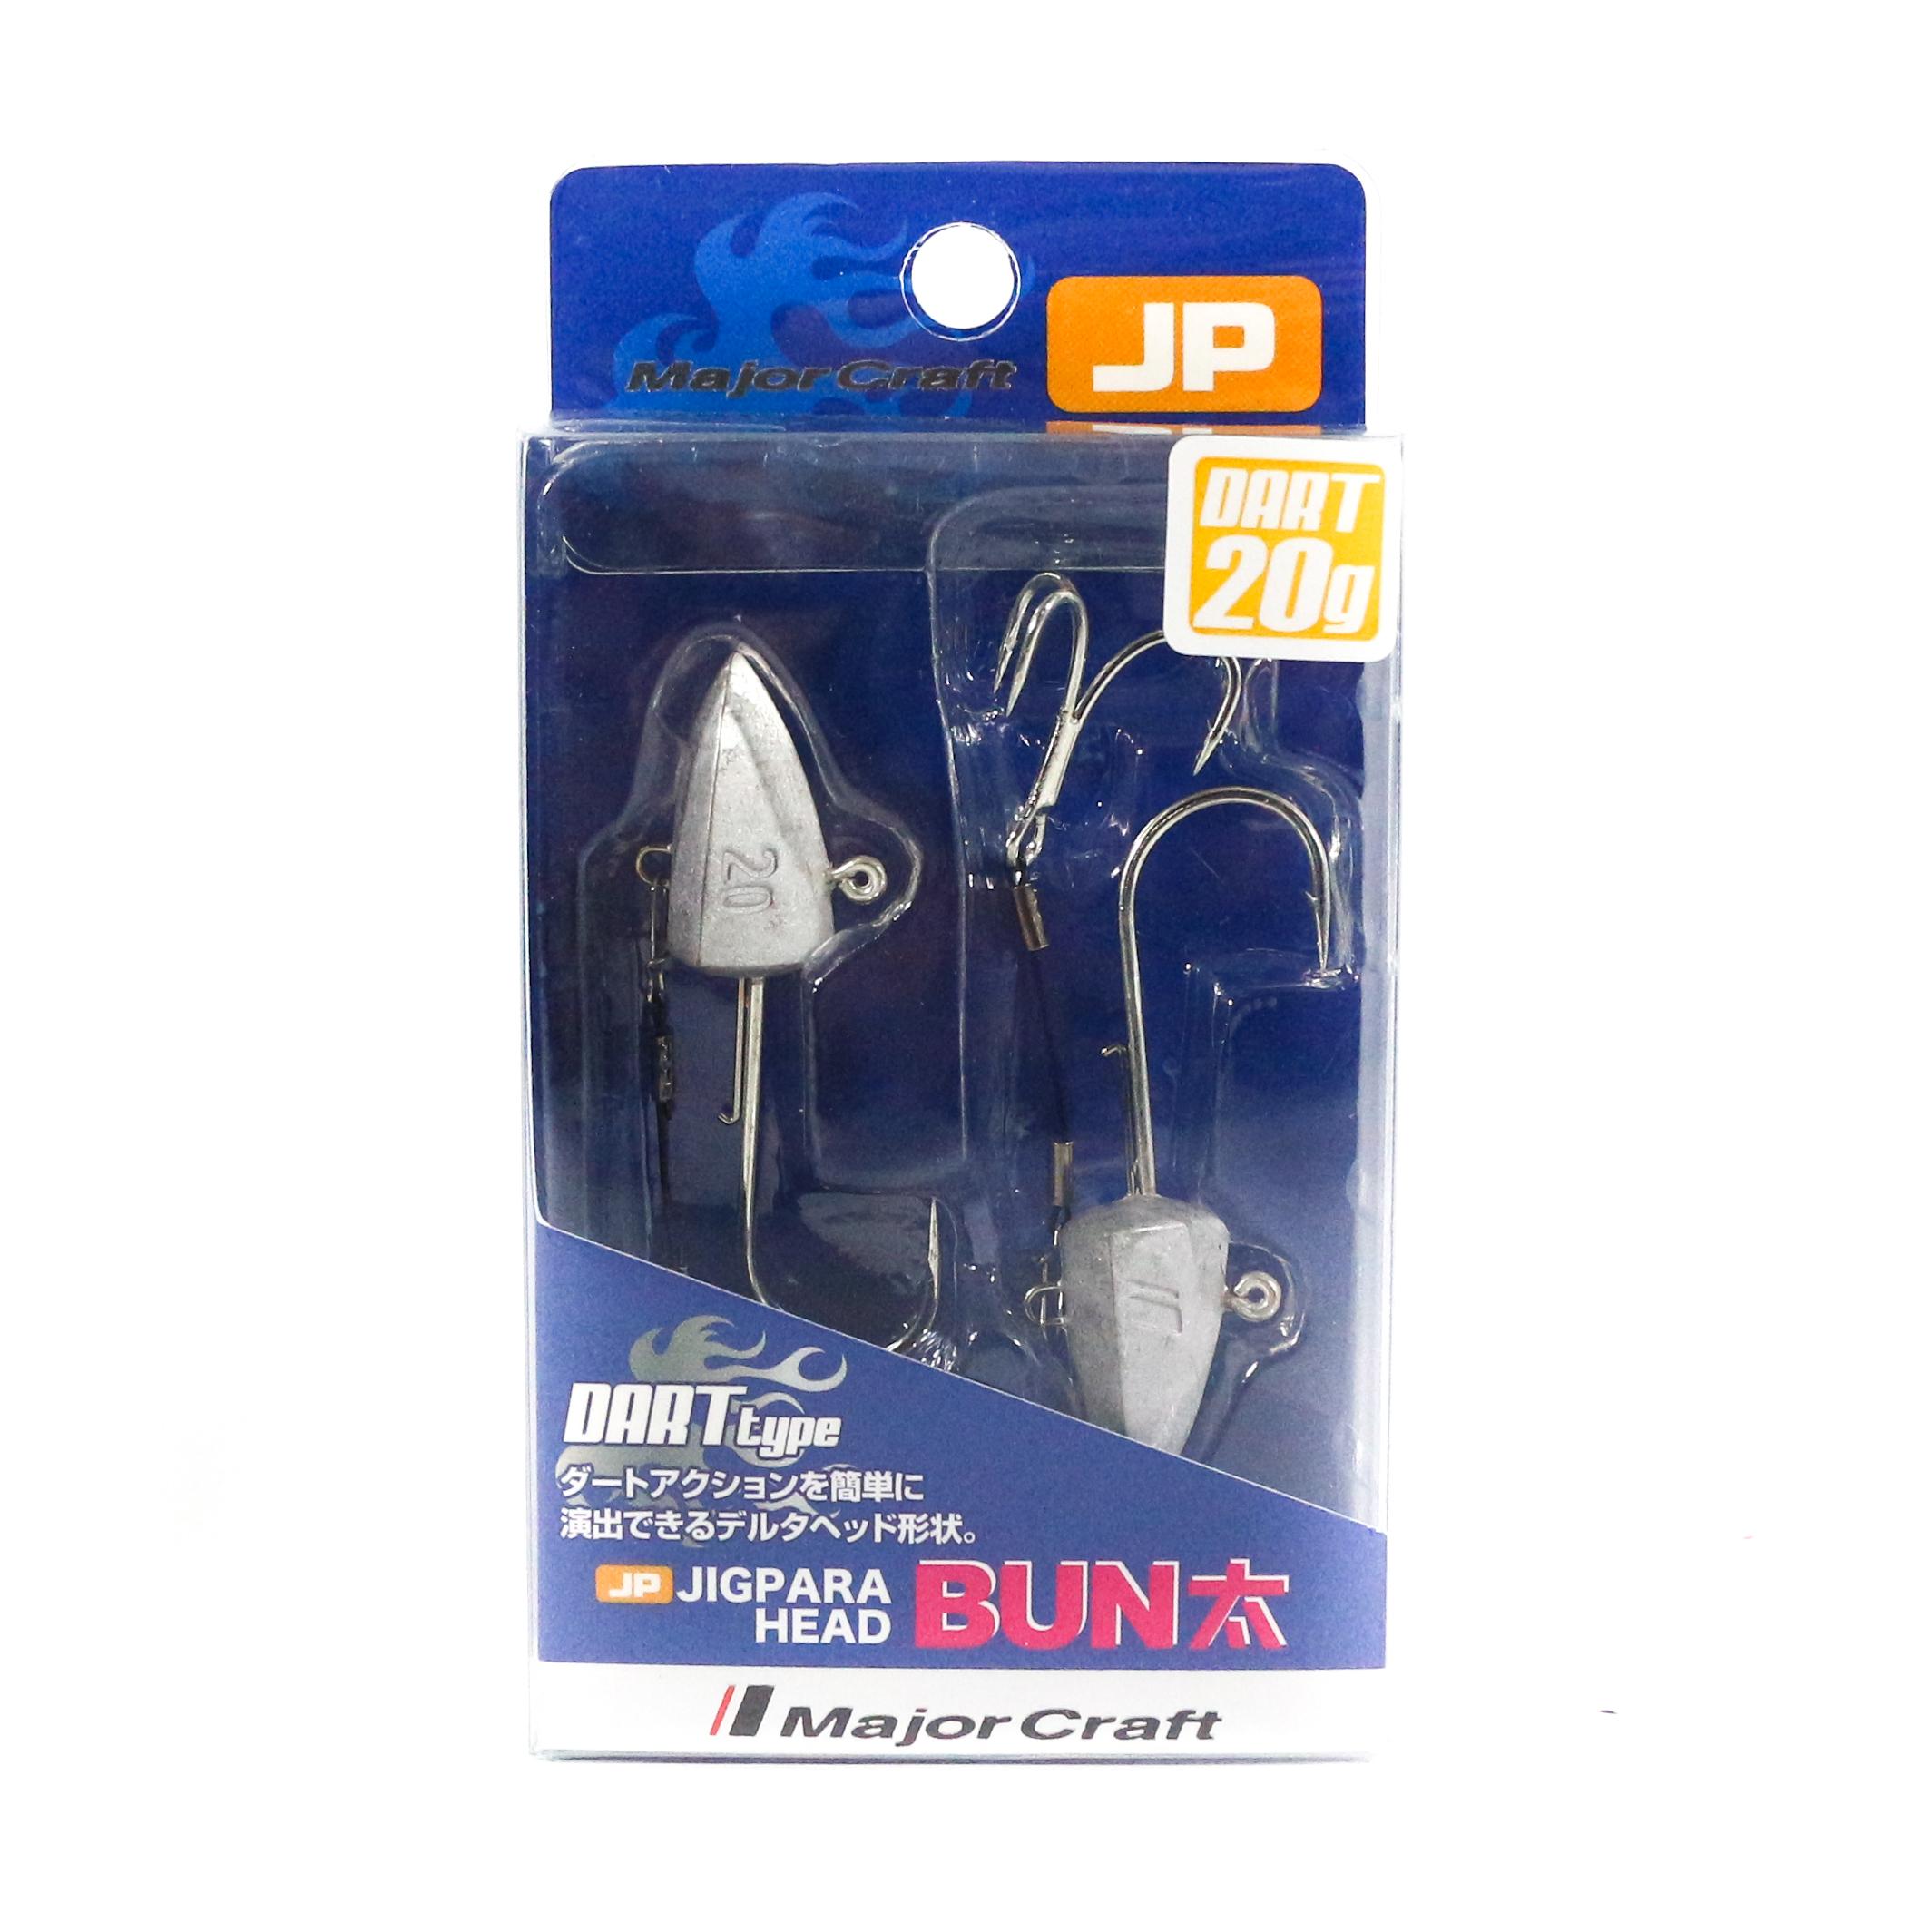 Major Craft Jig Head Dart JPBU-20 grams Size 1/0 (8614)